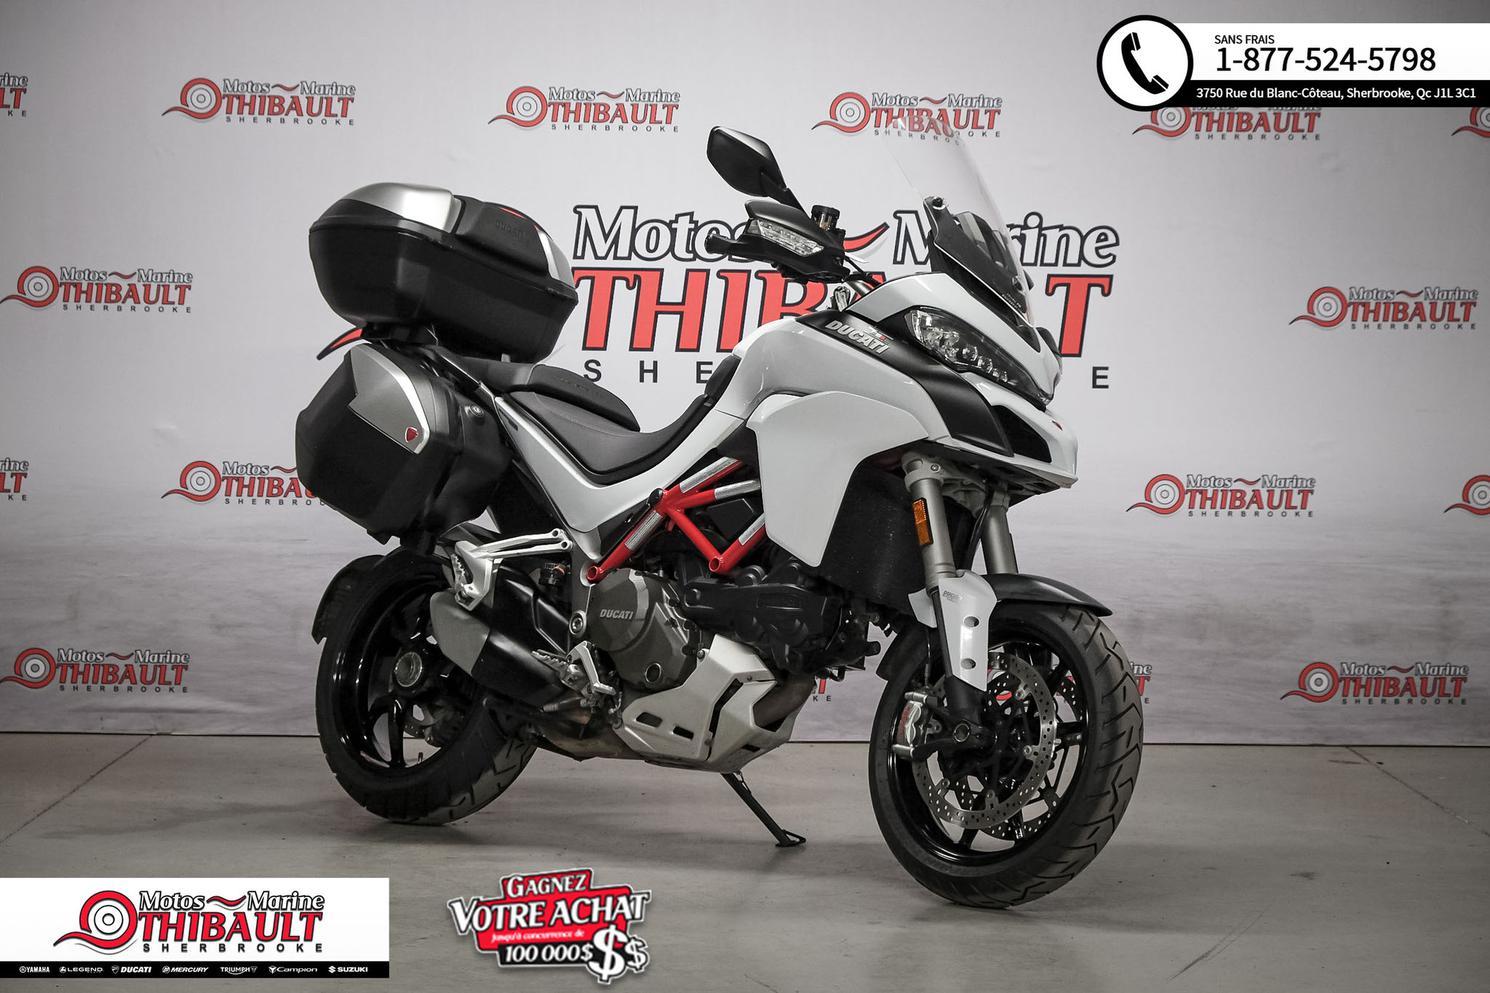 Ducati MTS1200ST 2015